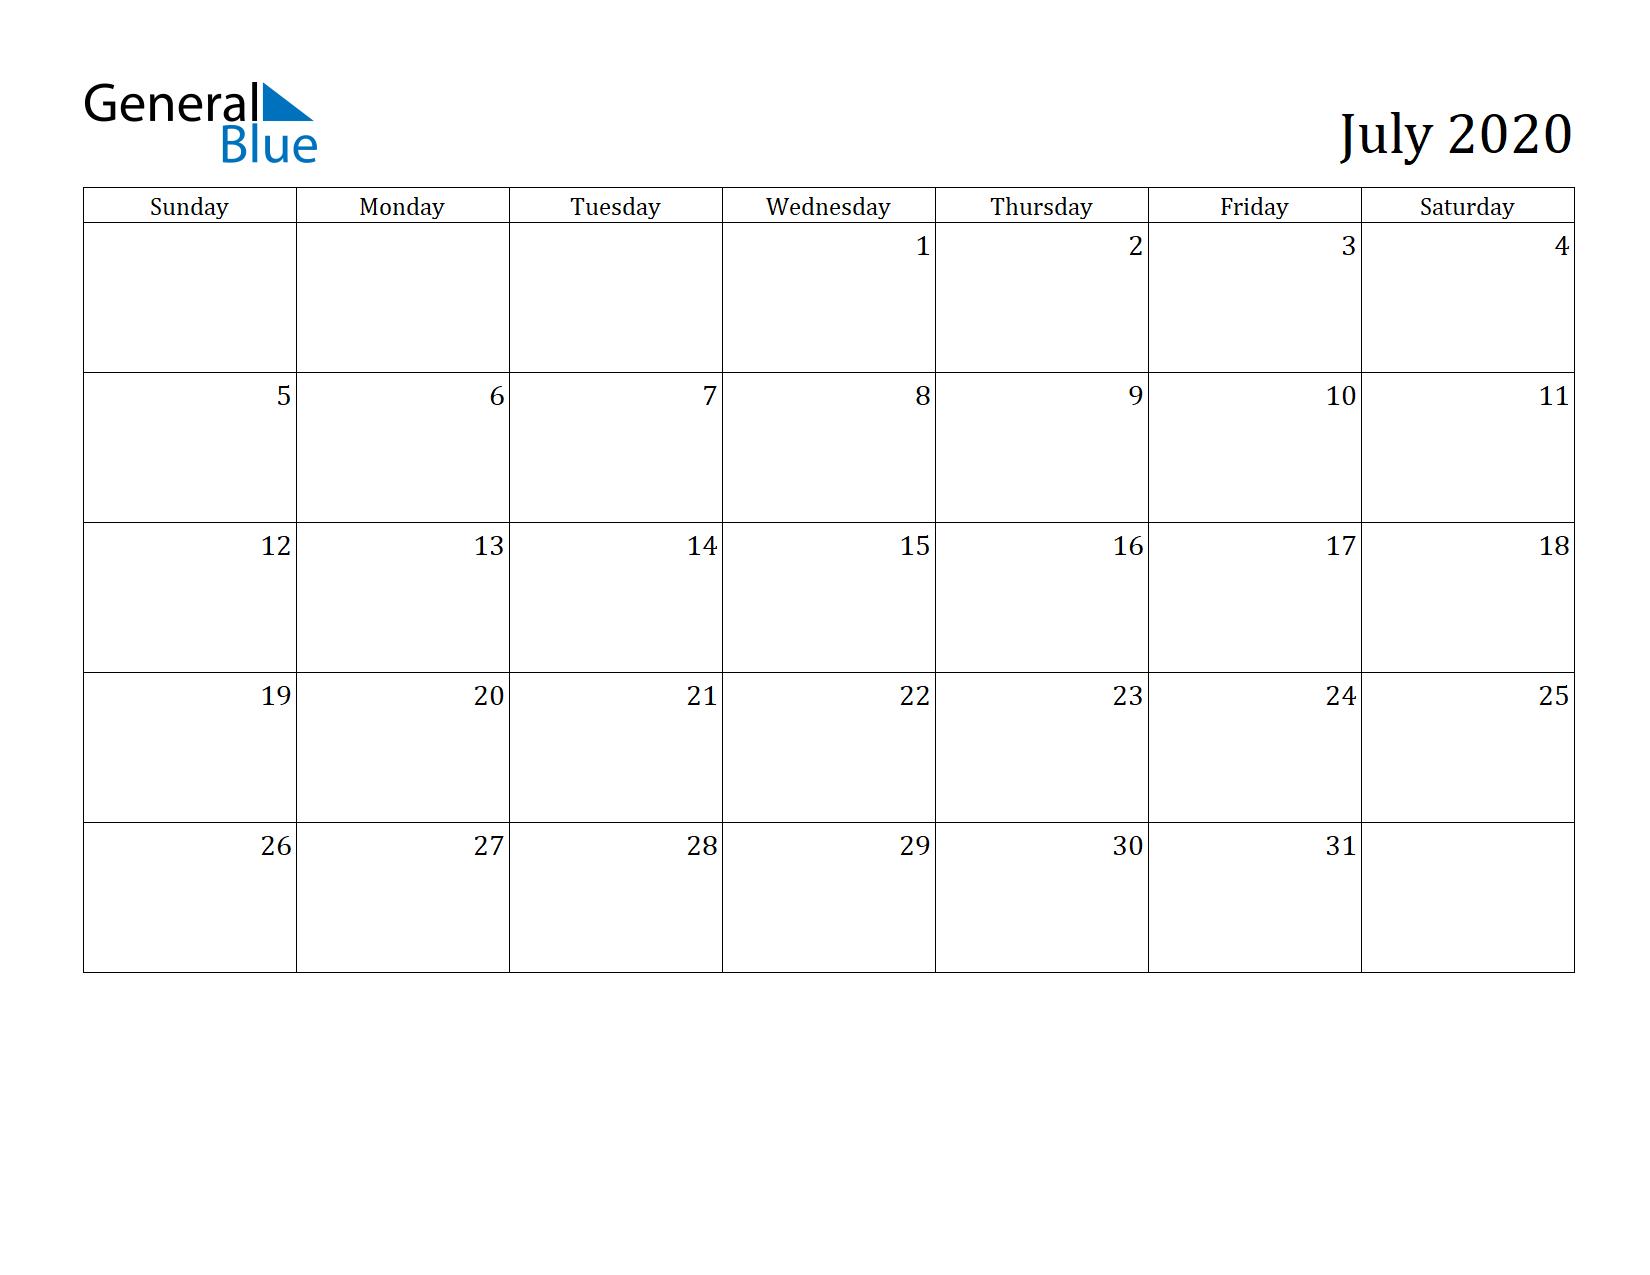 July Calendar 2020.July 2020 Calendar General Blue